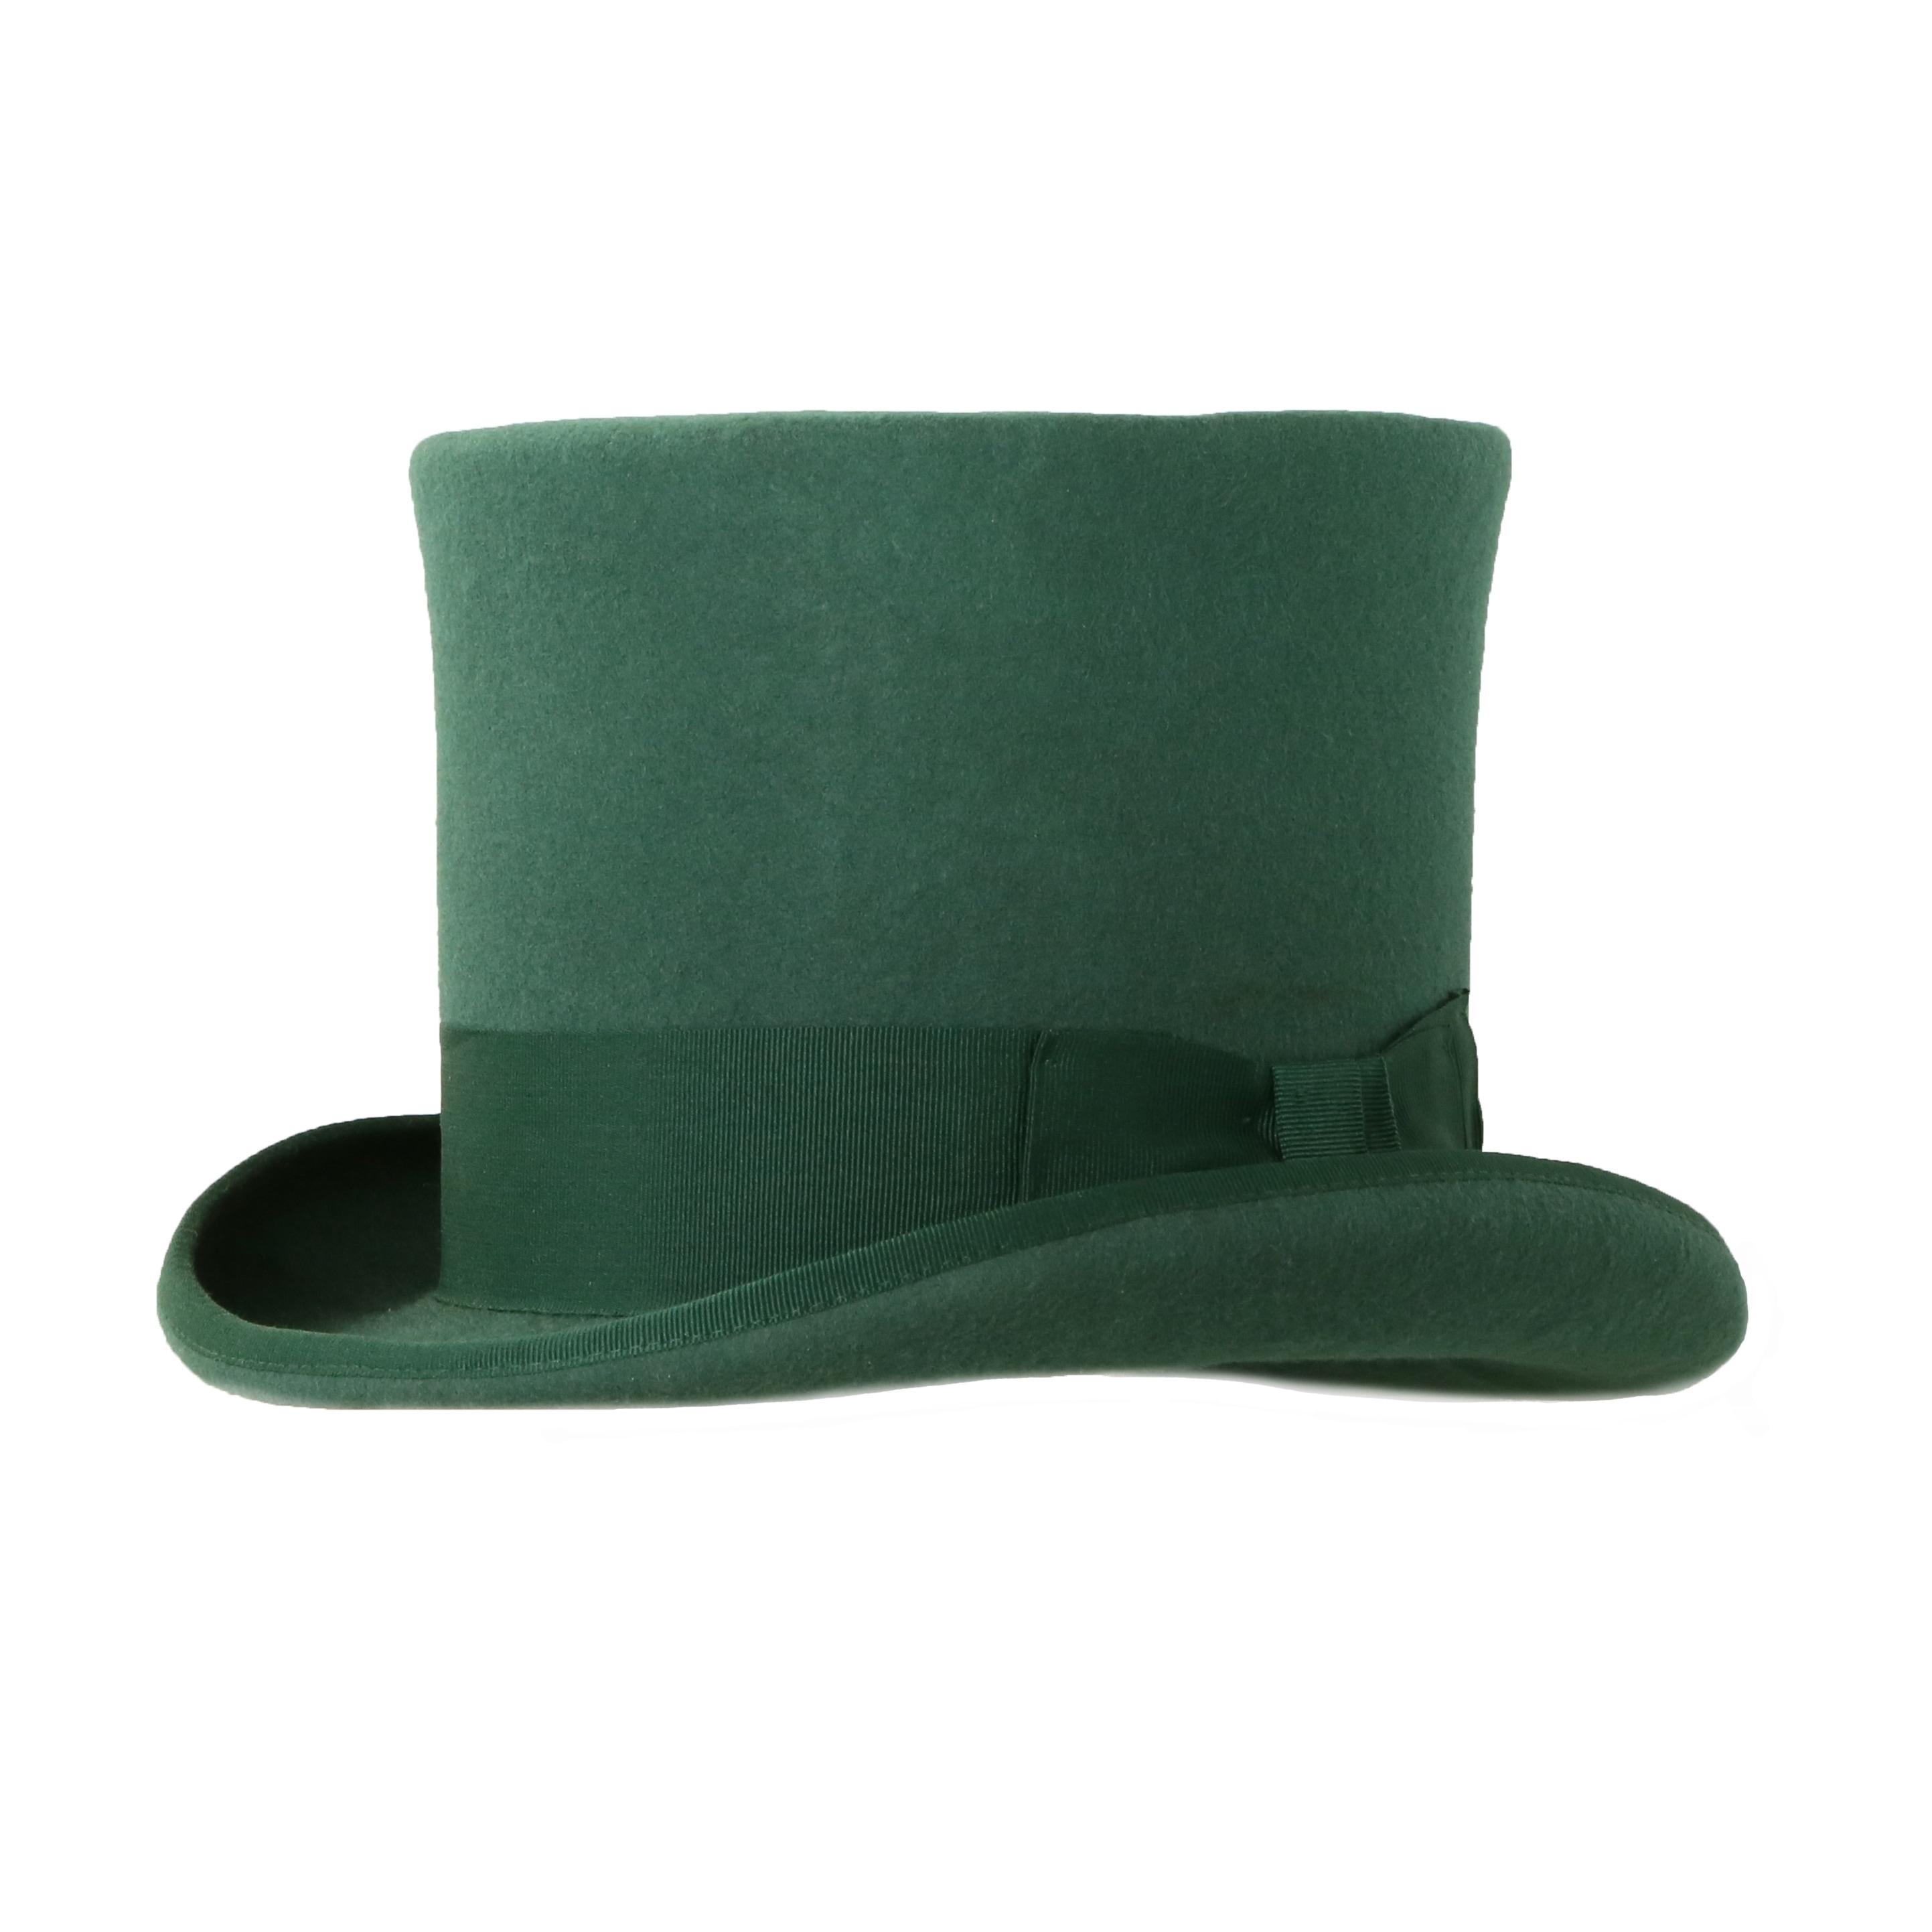 Vaak Shop Ferrecci Mens Hunter Green Premium Wool Mad Hatter Steampunk @RR52